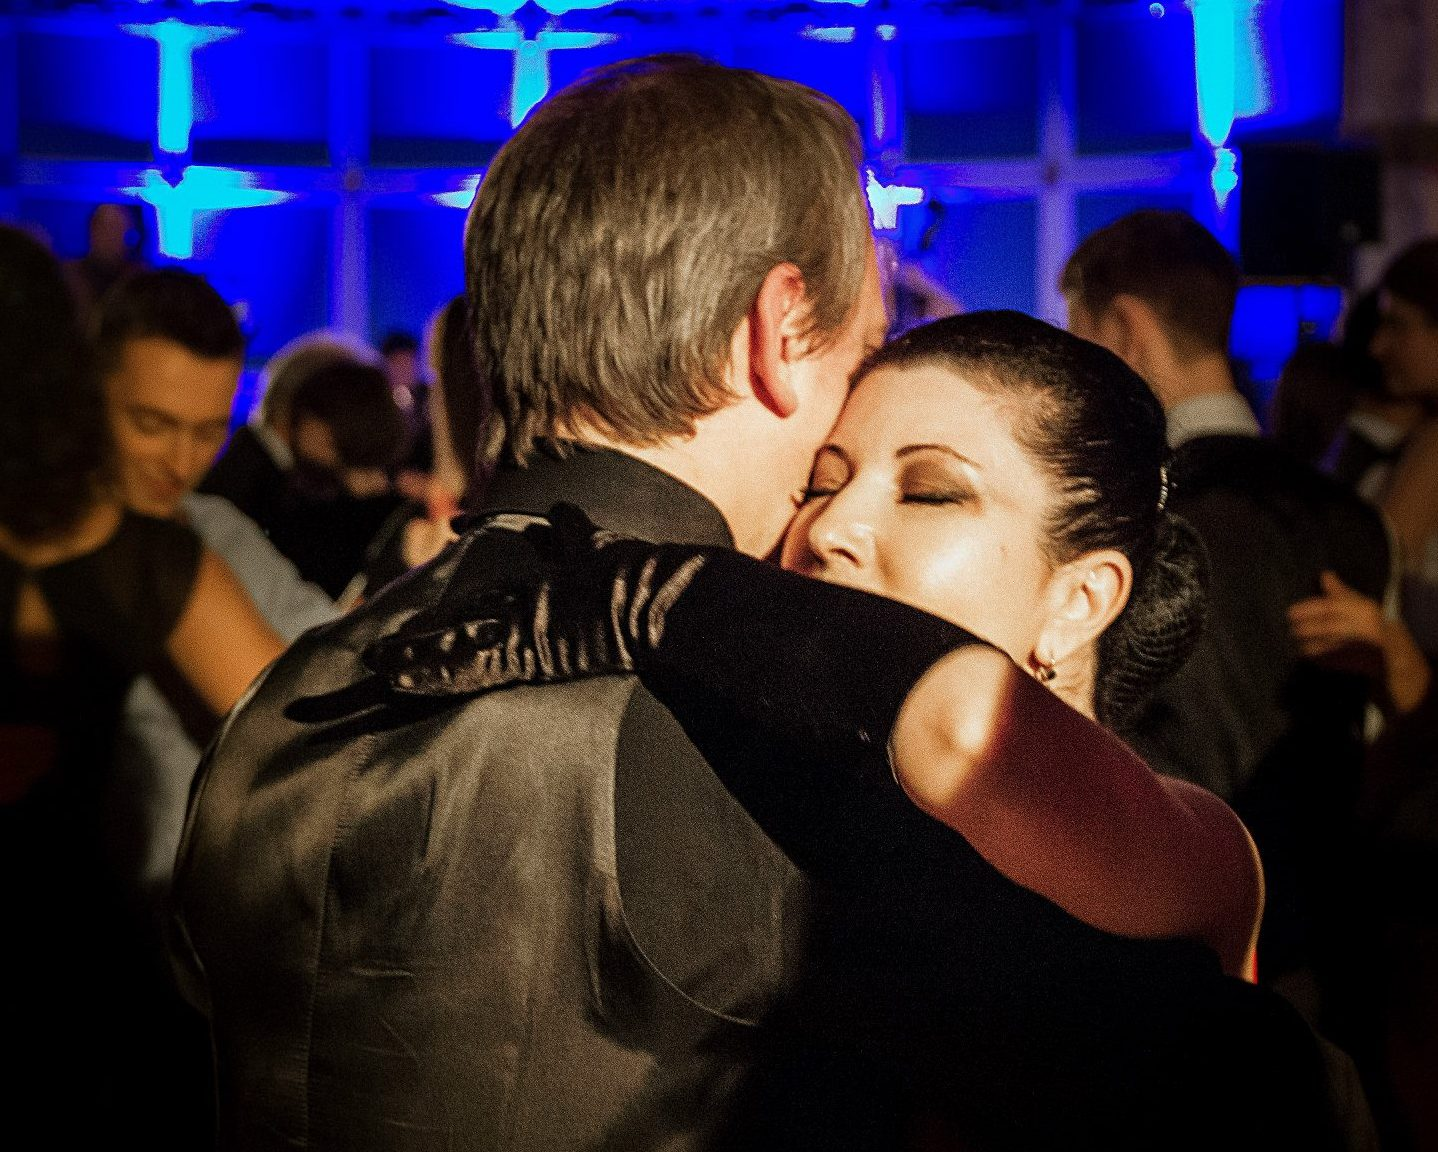 tango couple in a close embrace